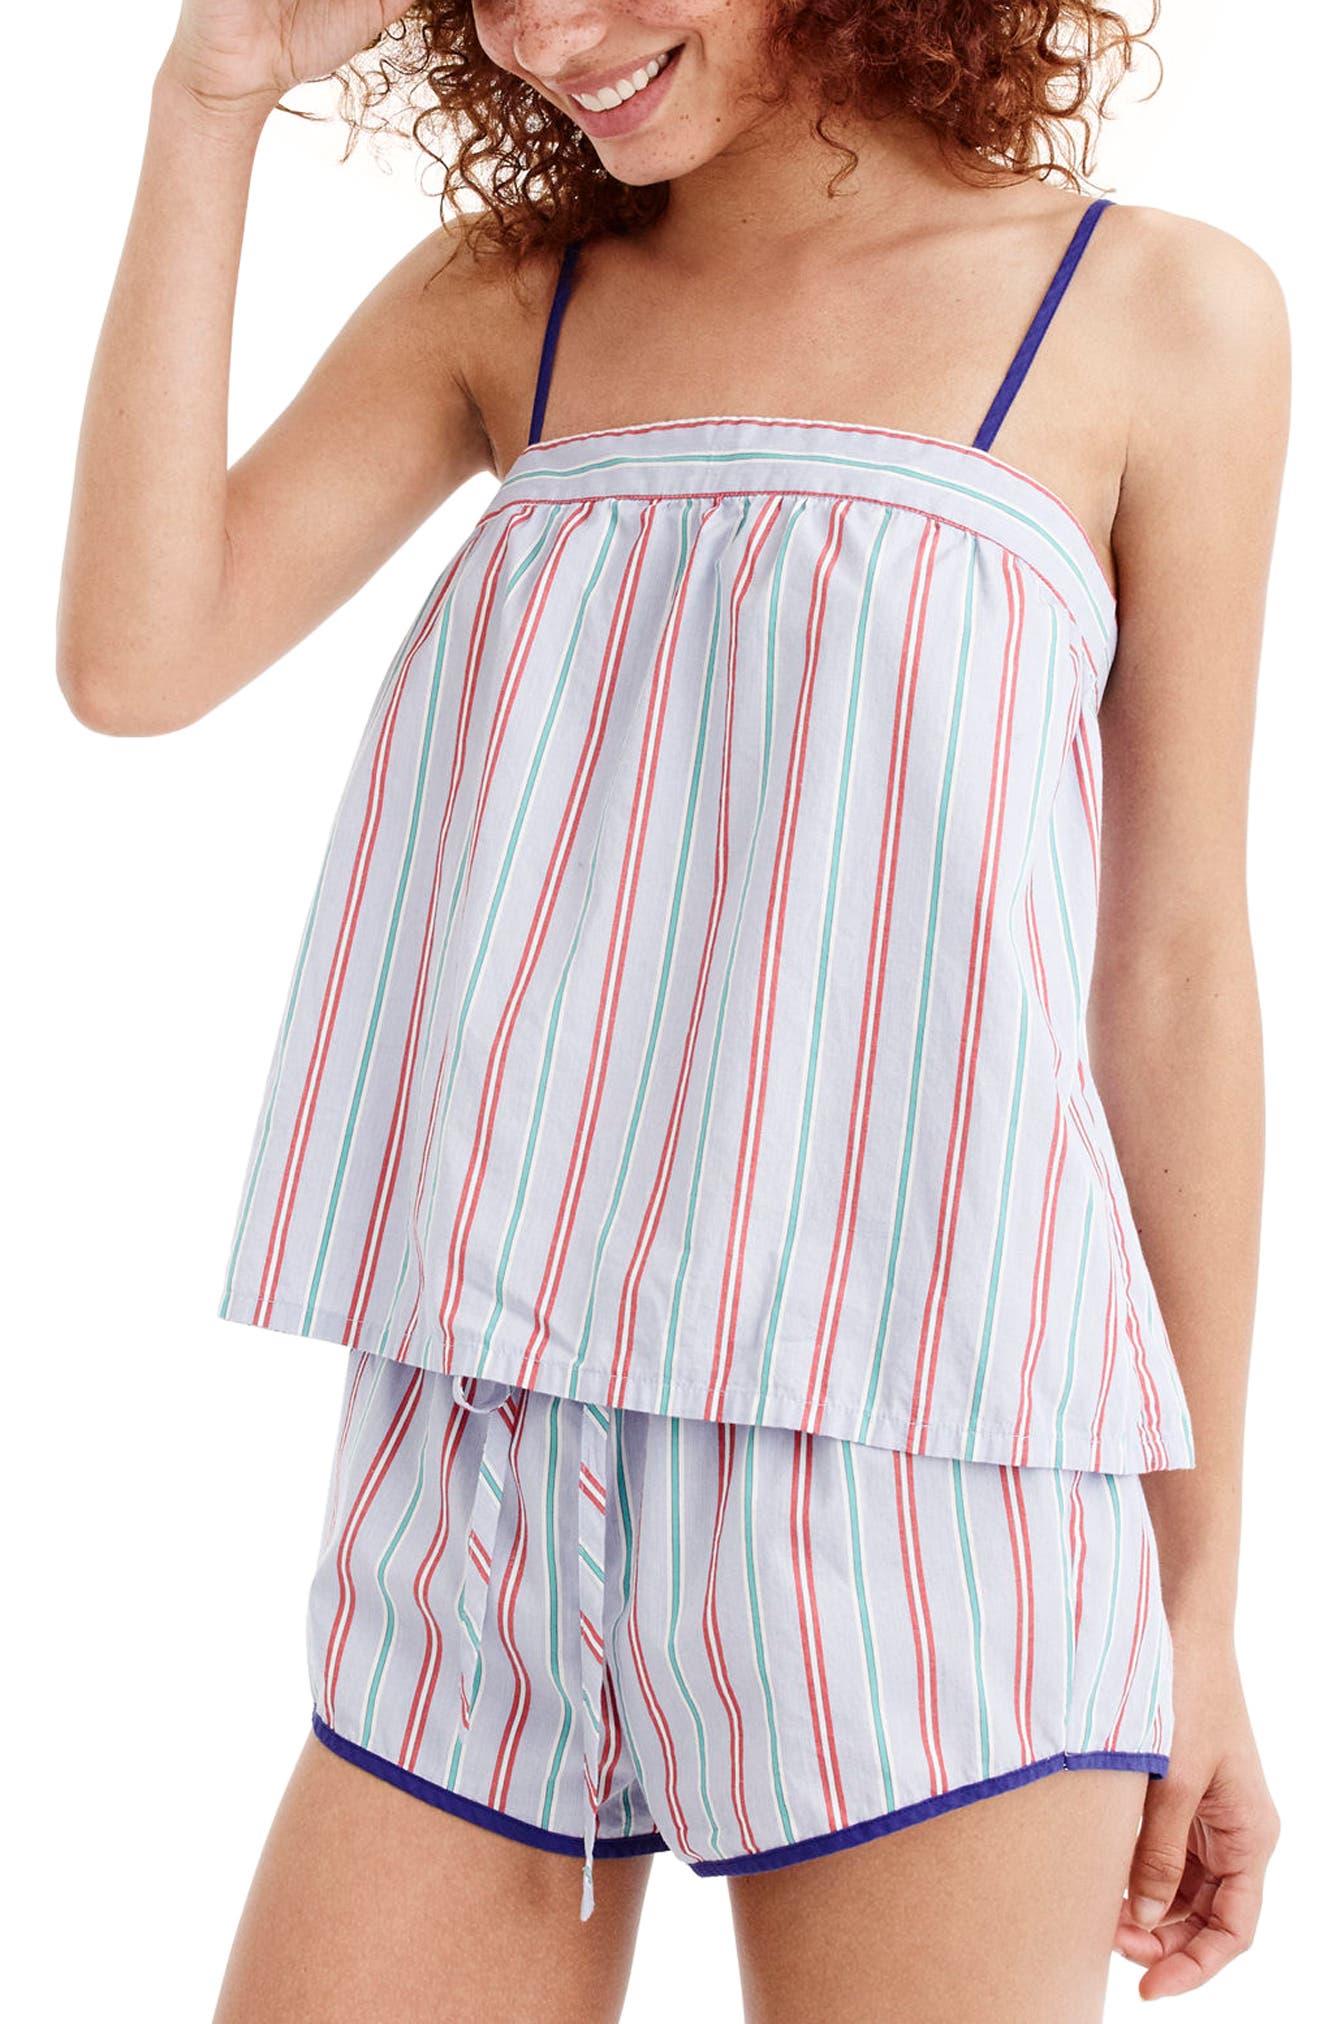 Candy Stripe Short Pajamas,                         Main,                         color, 400